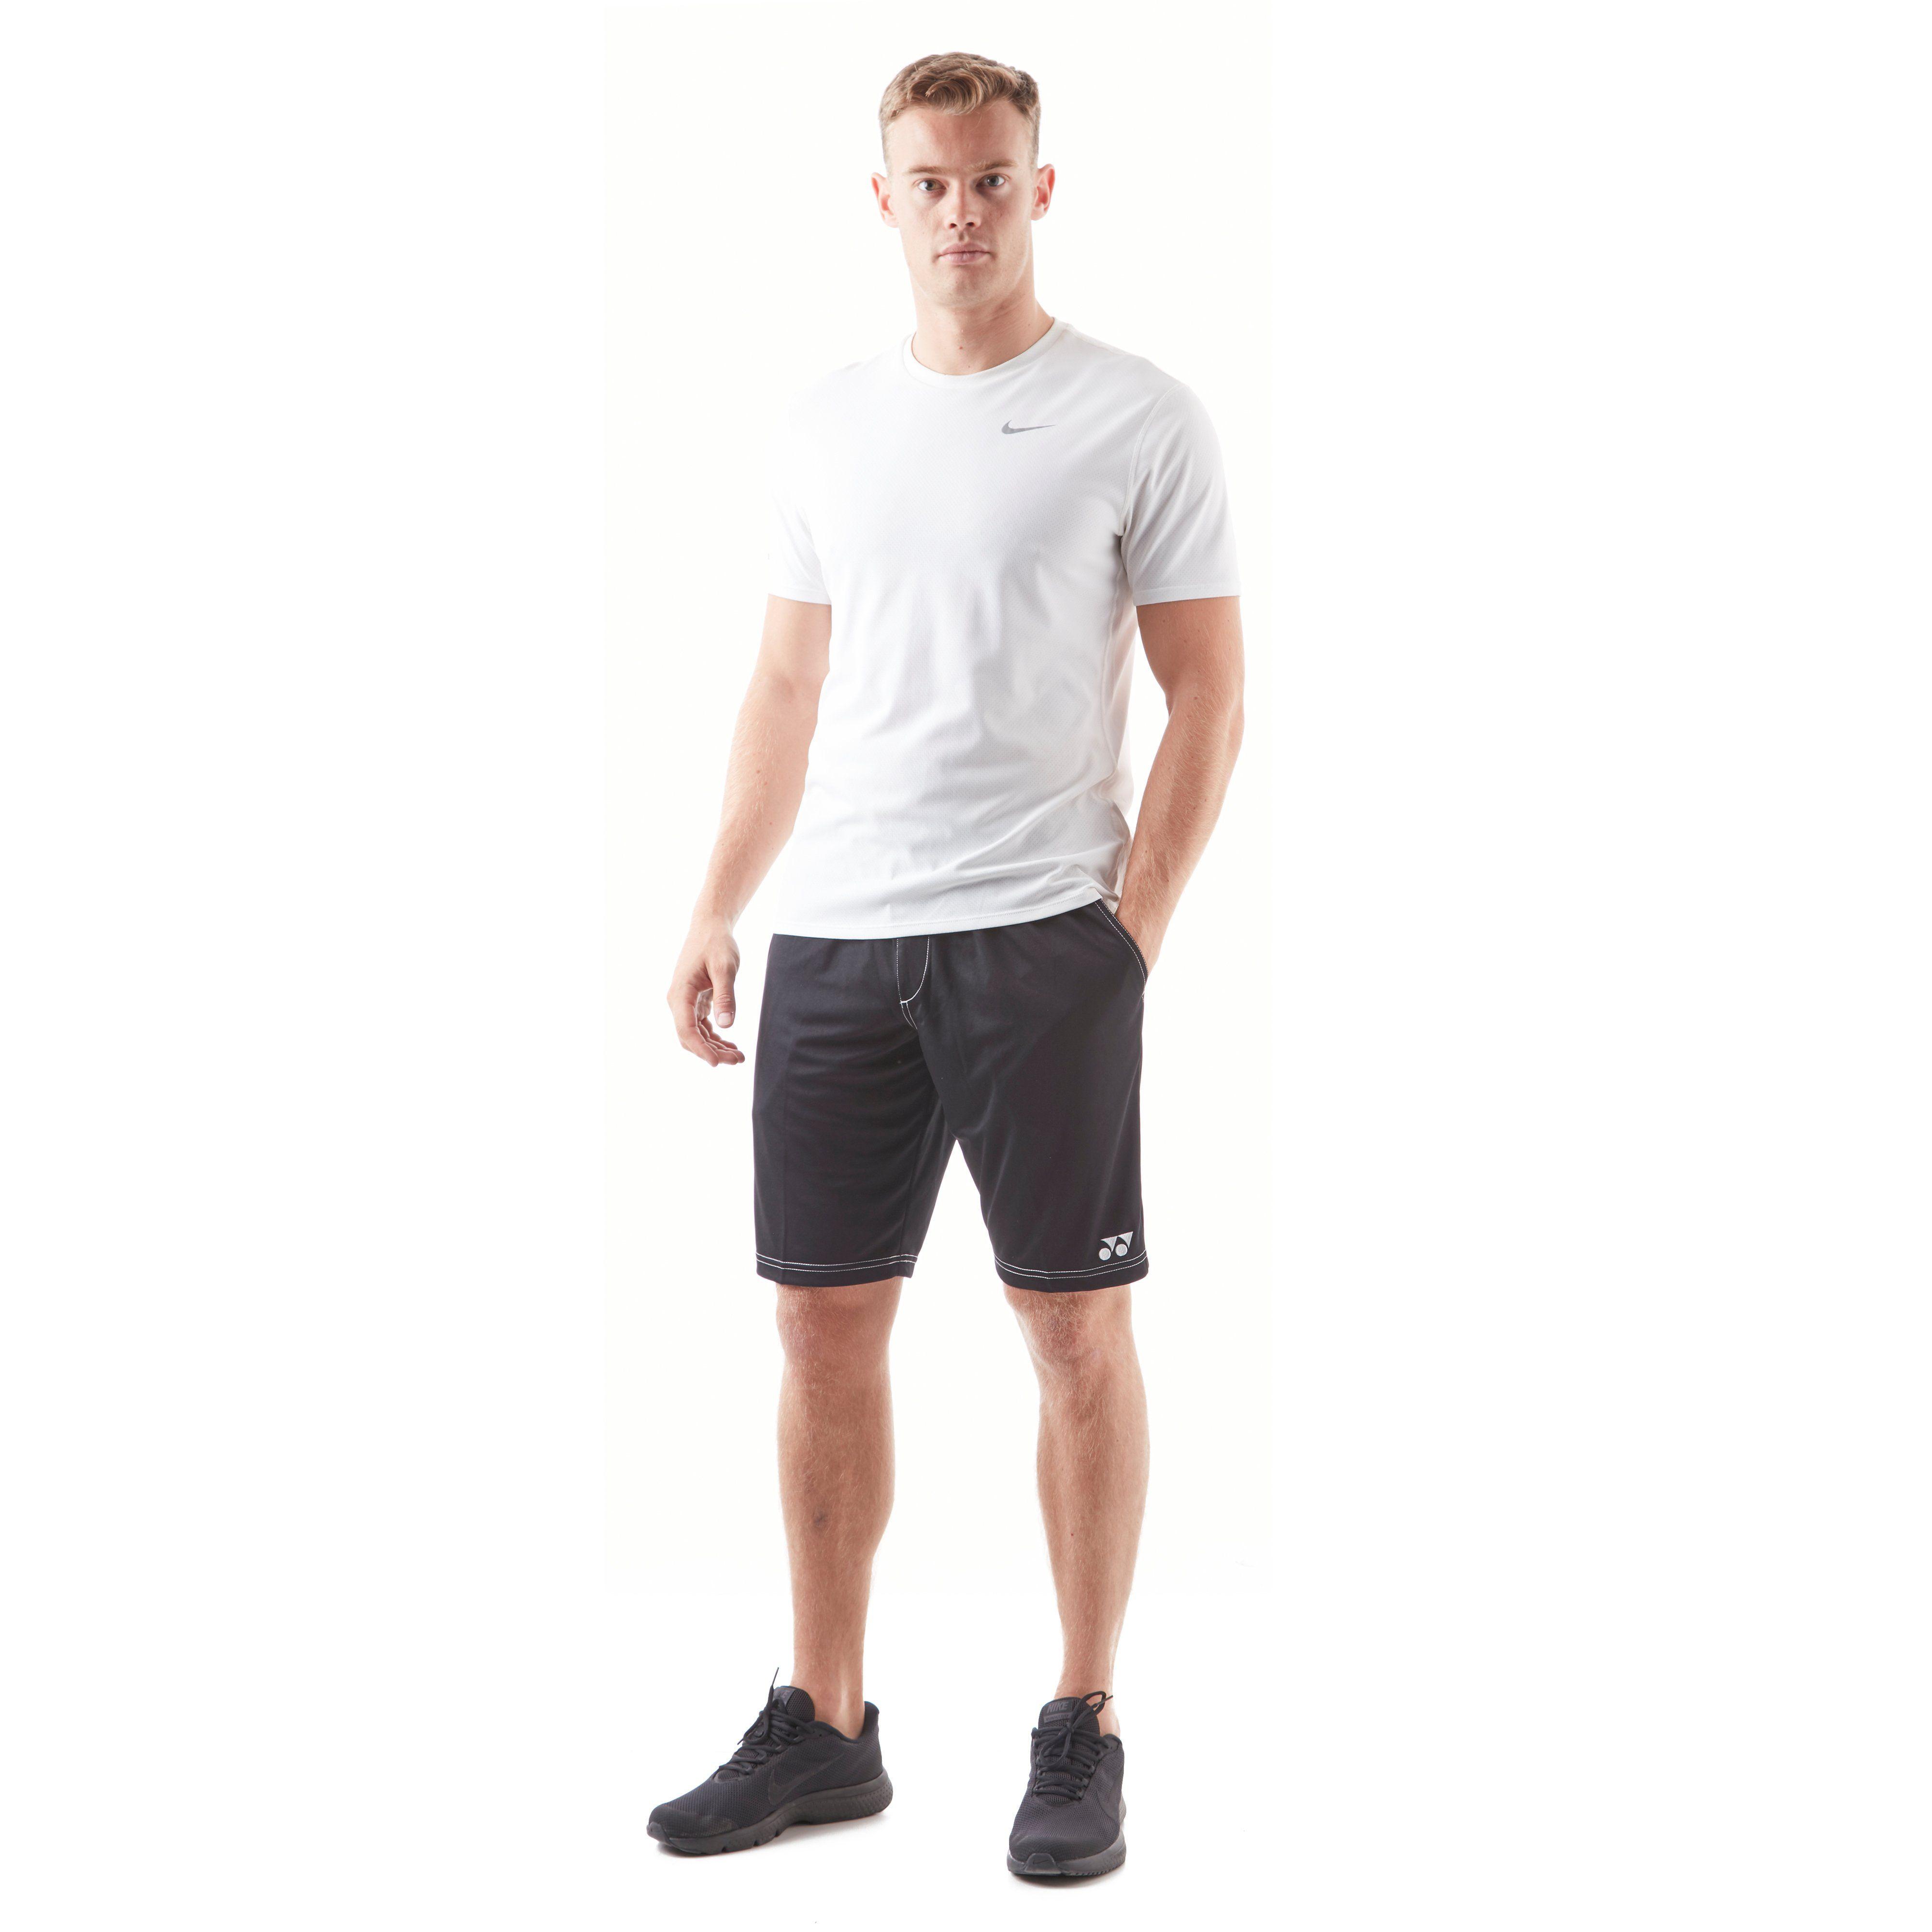 Yonex Men's Badminton Shorts